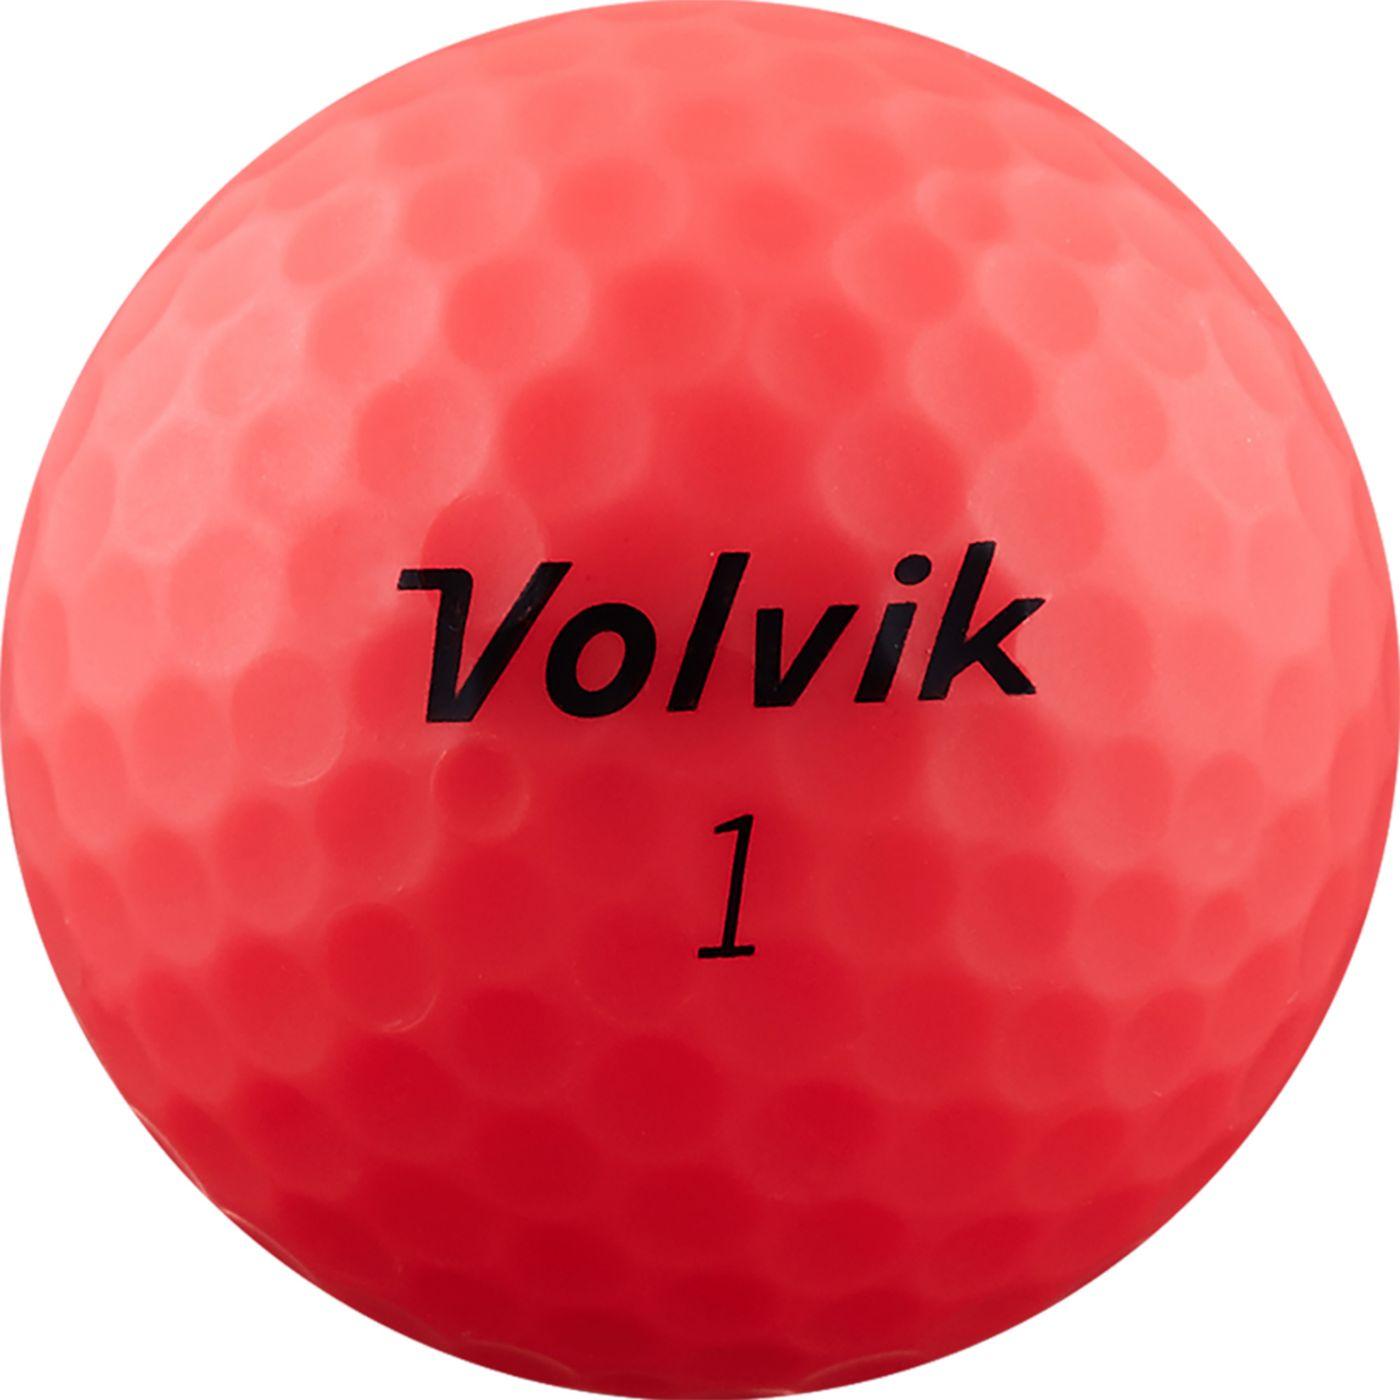 Volvik 2019 ViMAX Soft Red Golf Balls